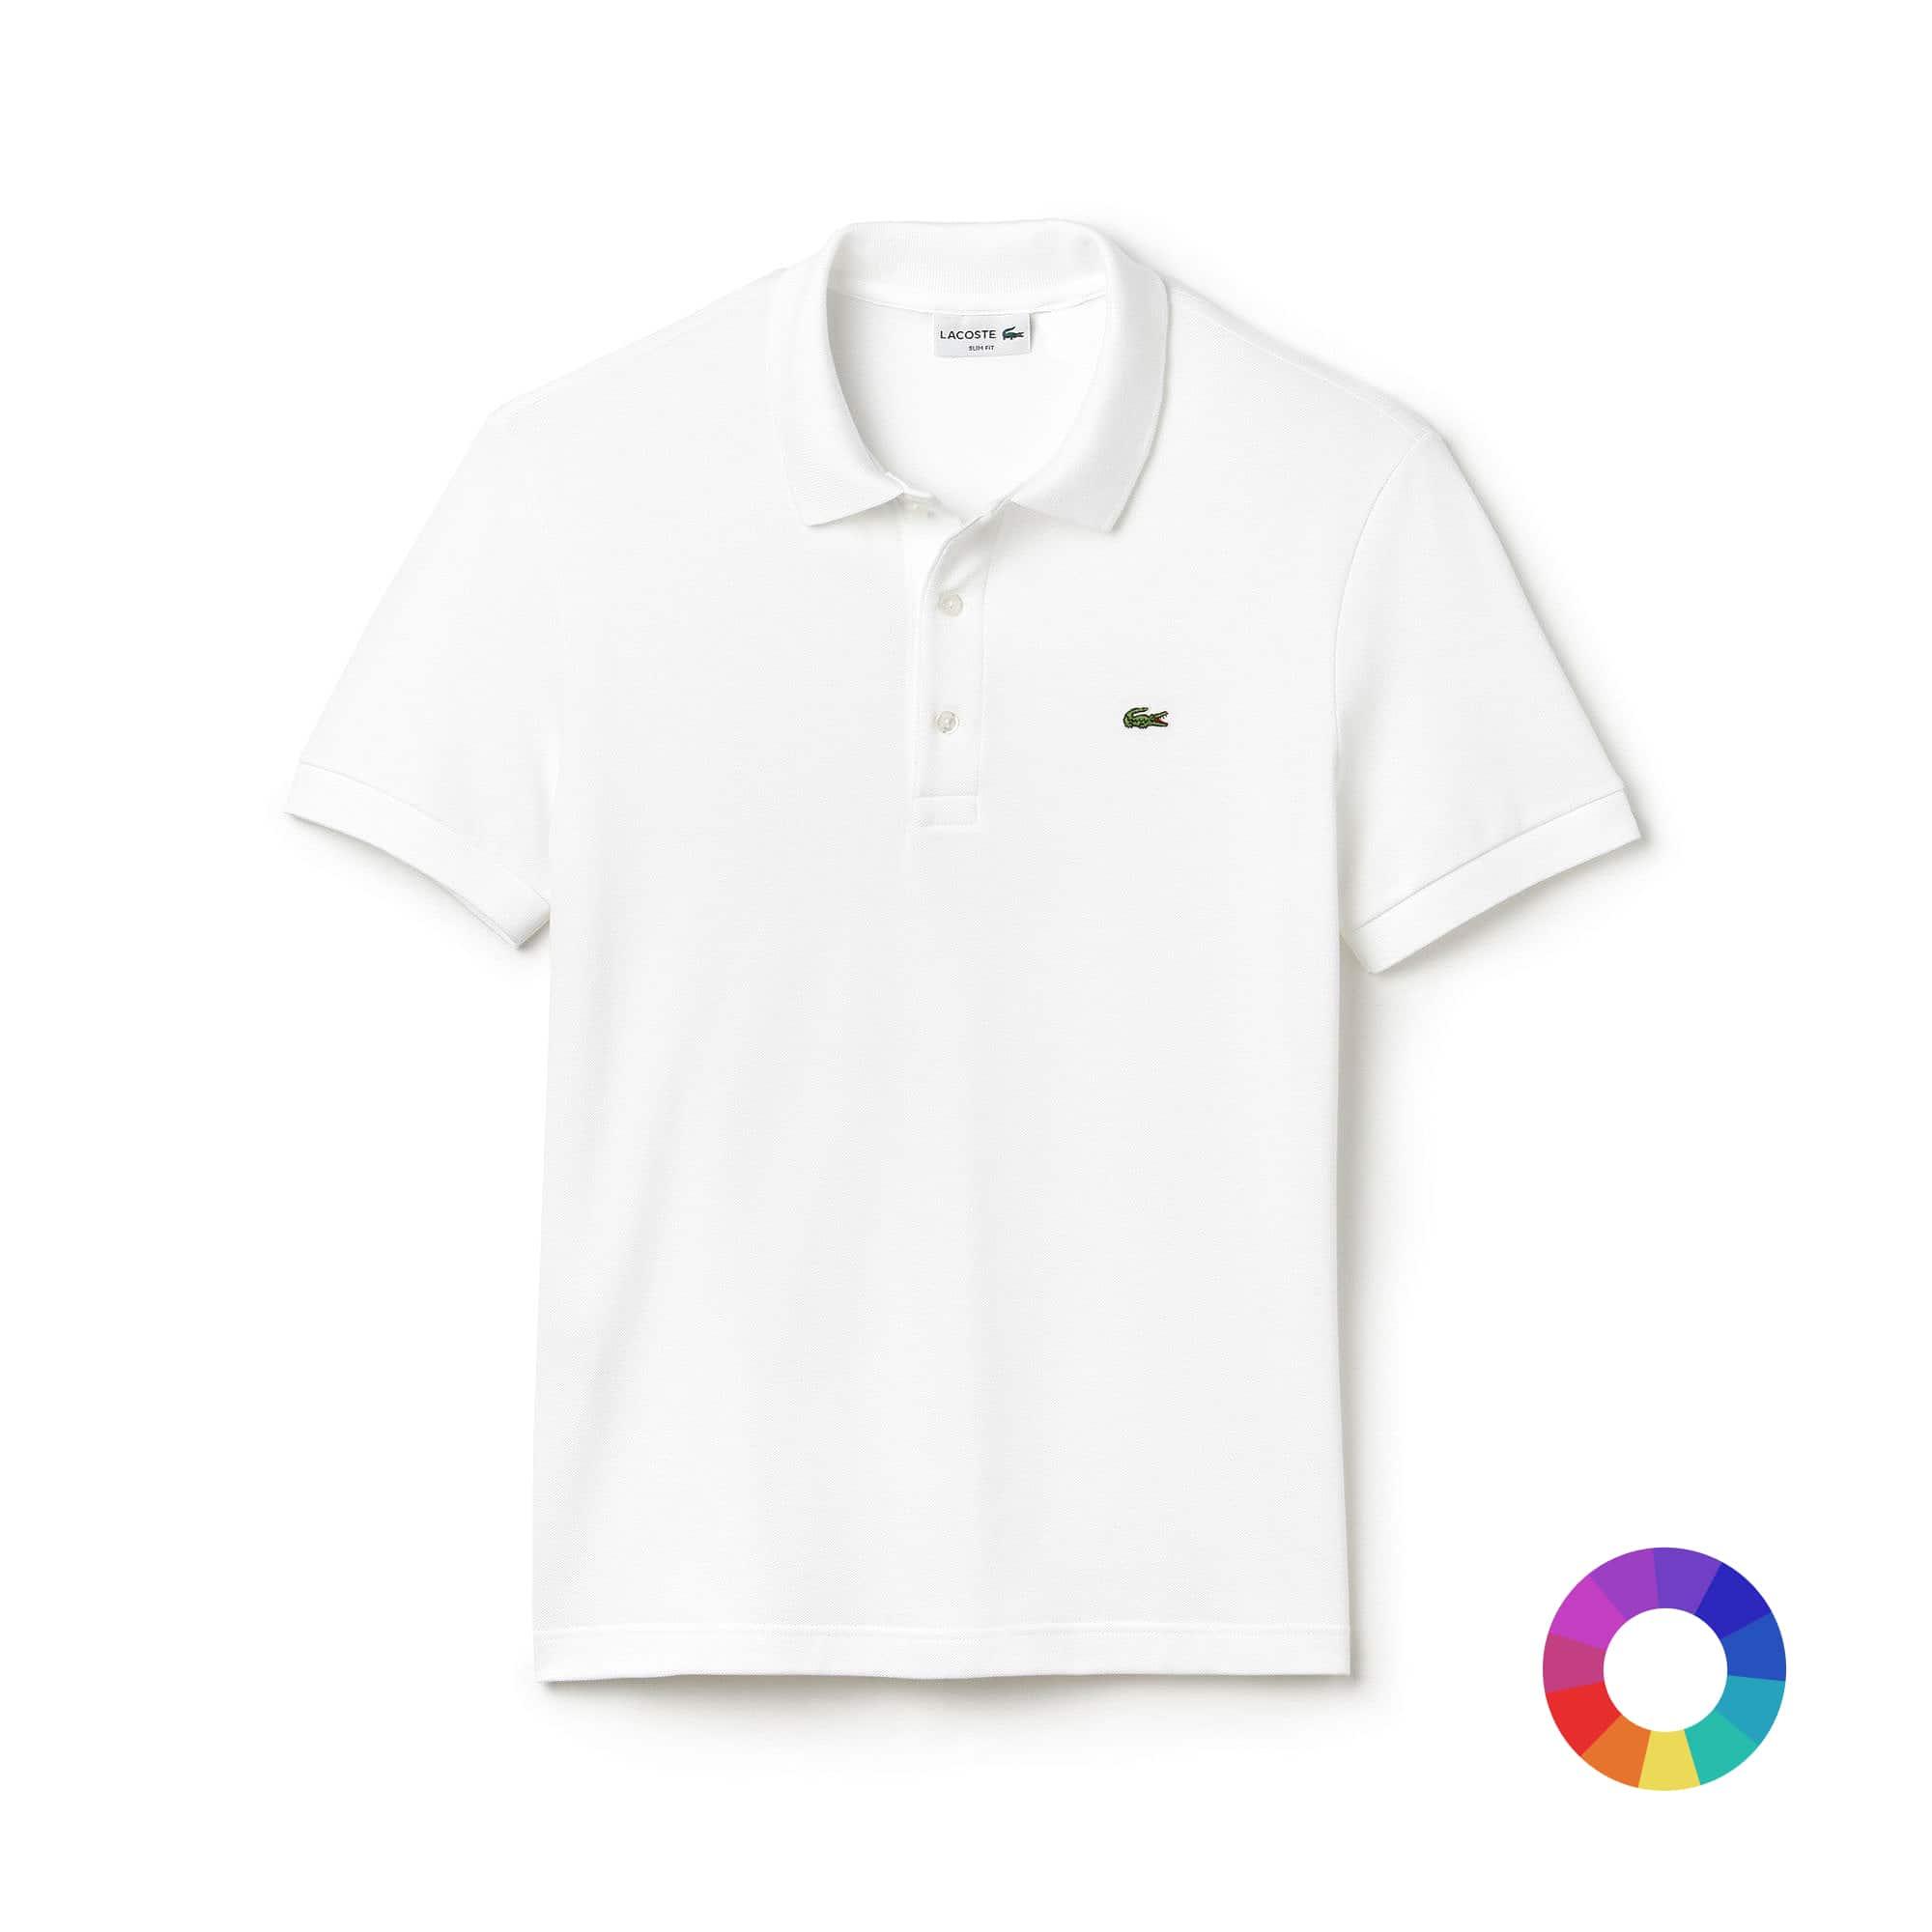 Personalisiertes L.12.12 Poloshirt